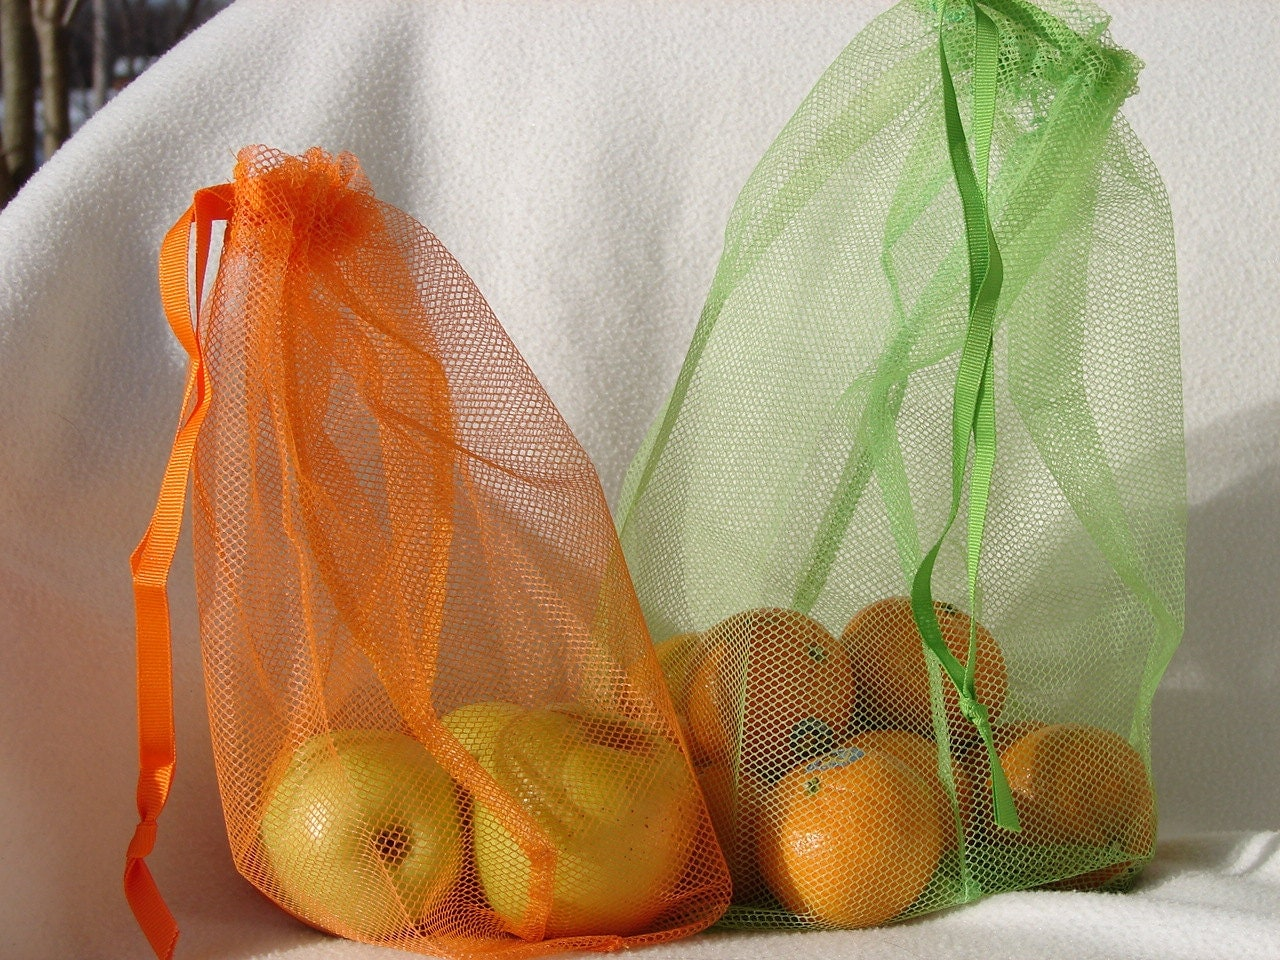 Reusable produce bags, veggie bag for Farmer's Market, set of 3 - ElleJayStudios